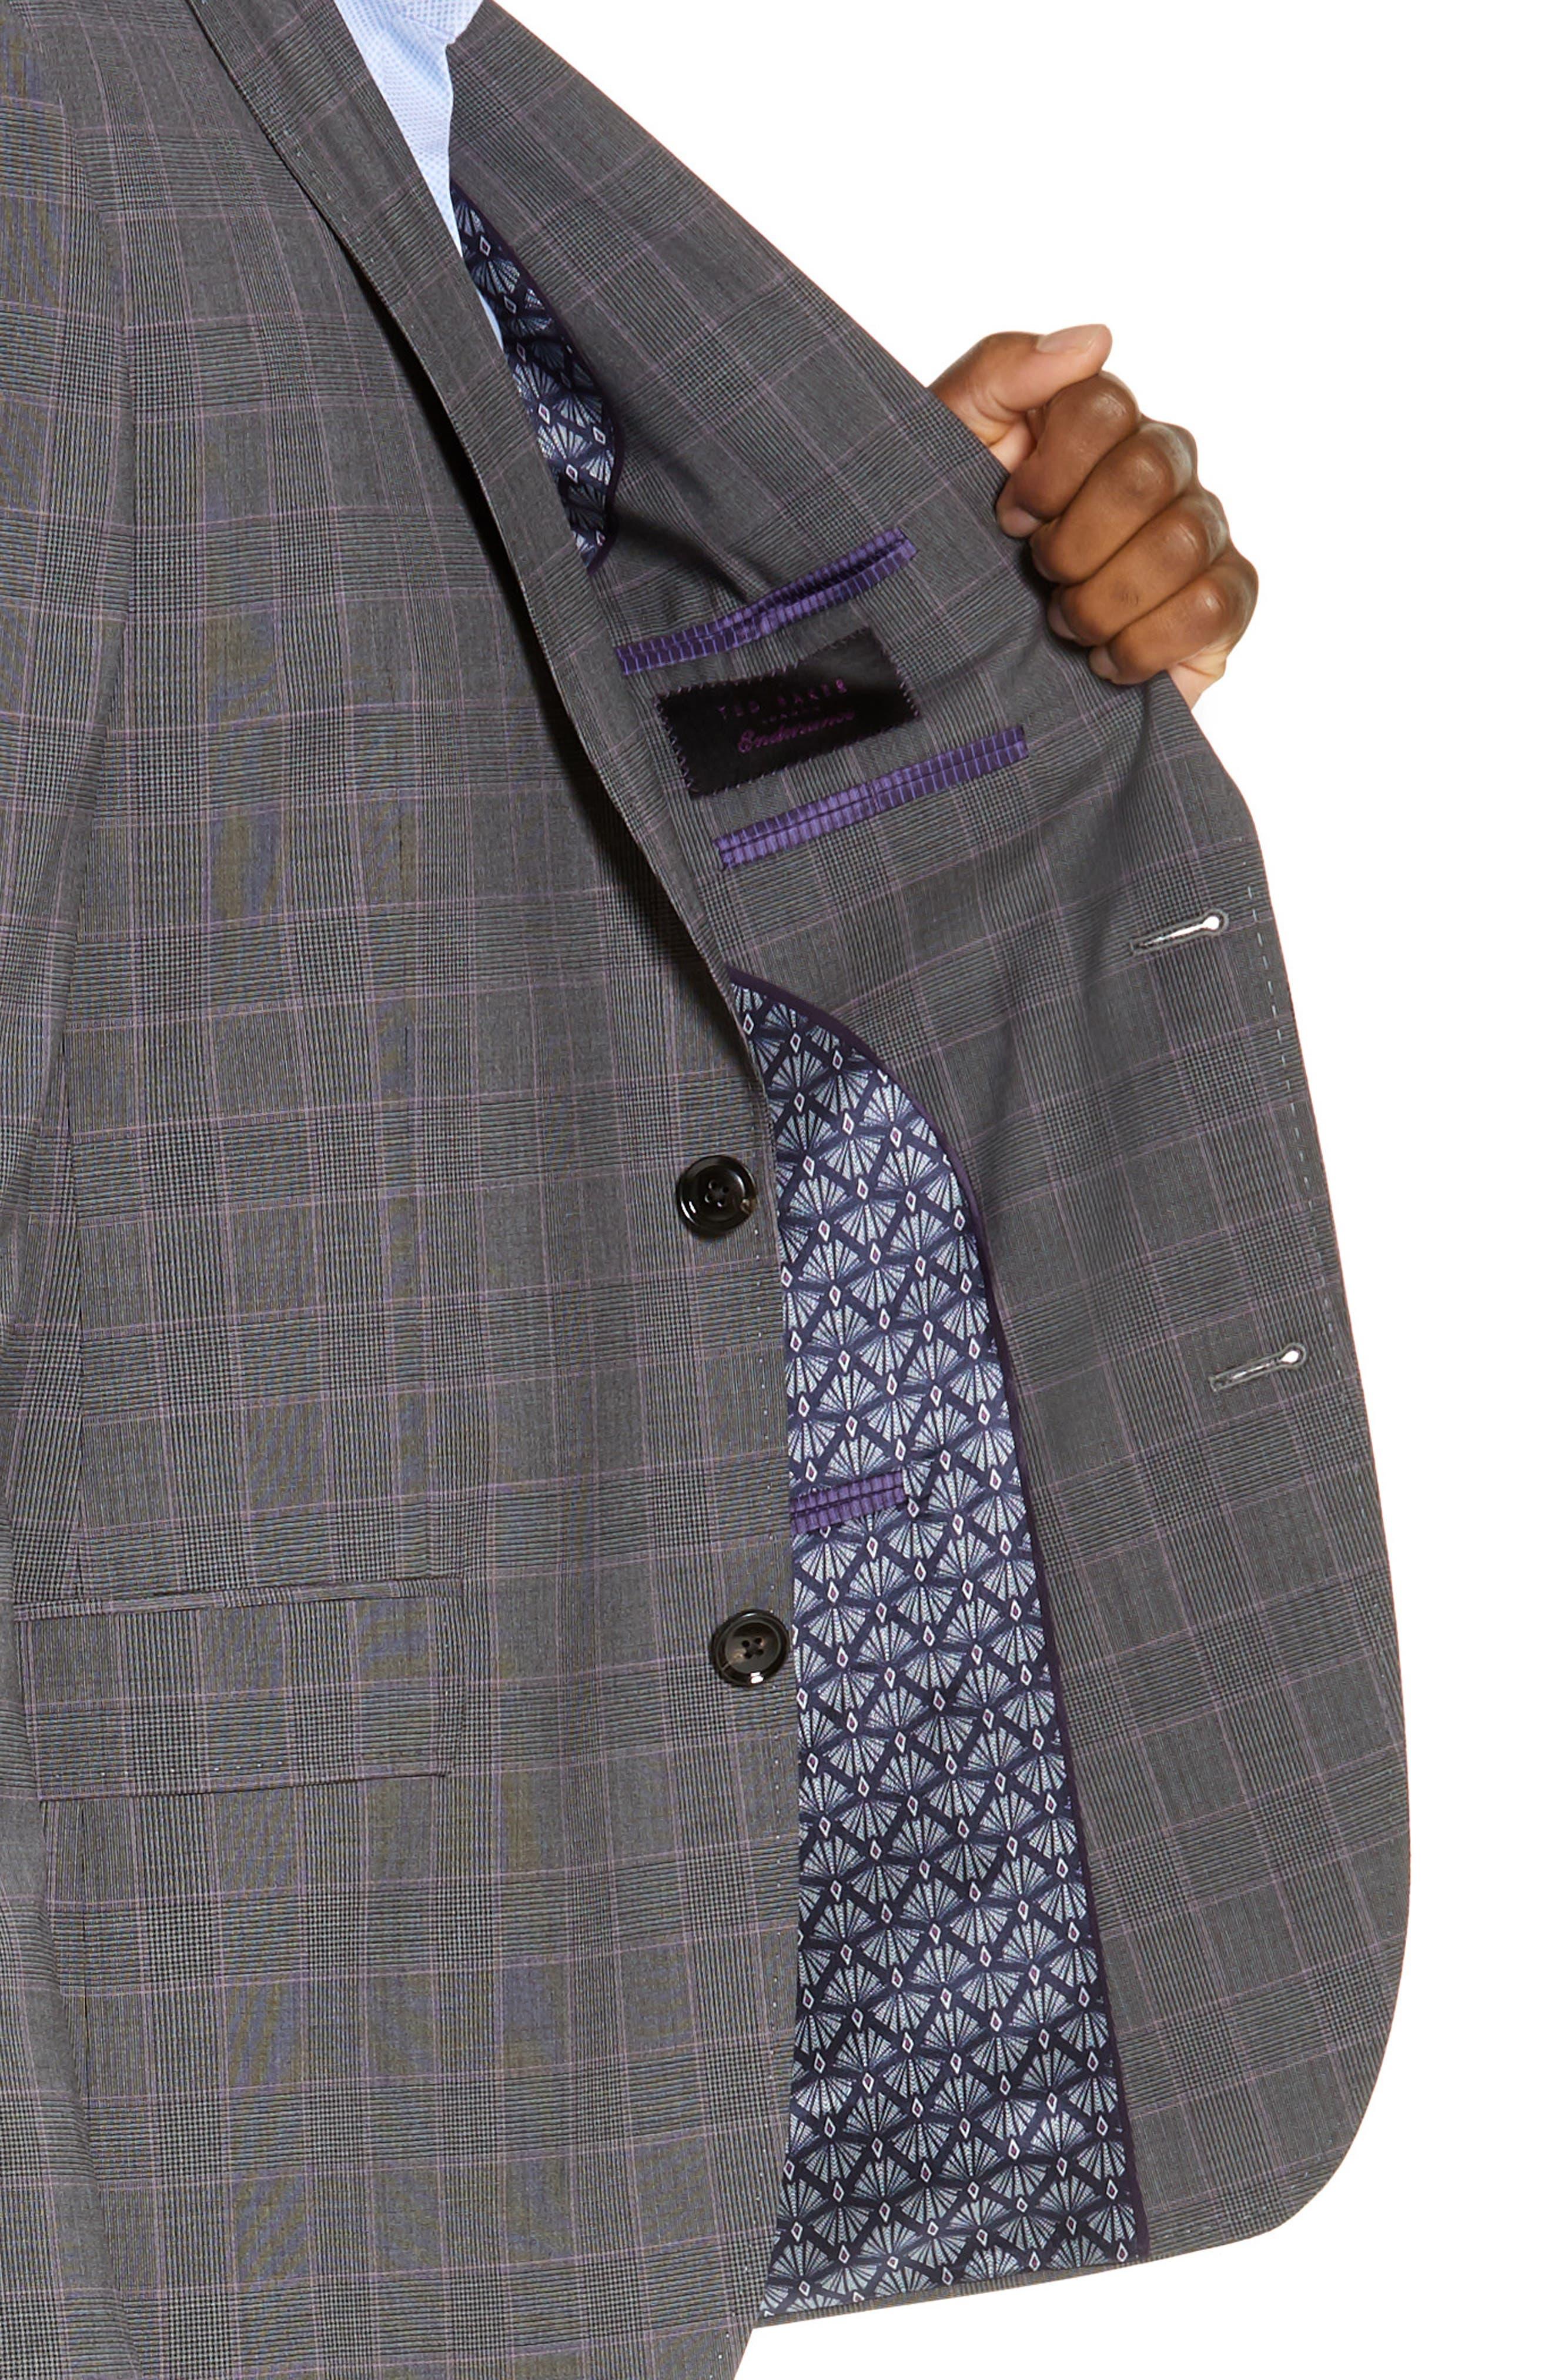 TED BAKER LONDON,                             Jay Trim Fit Plaid Wool Suit,                             Alternate thumbnail 4, color,                             GREY